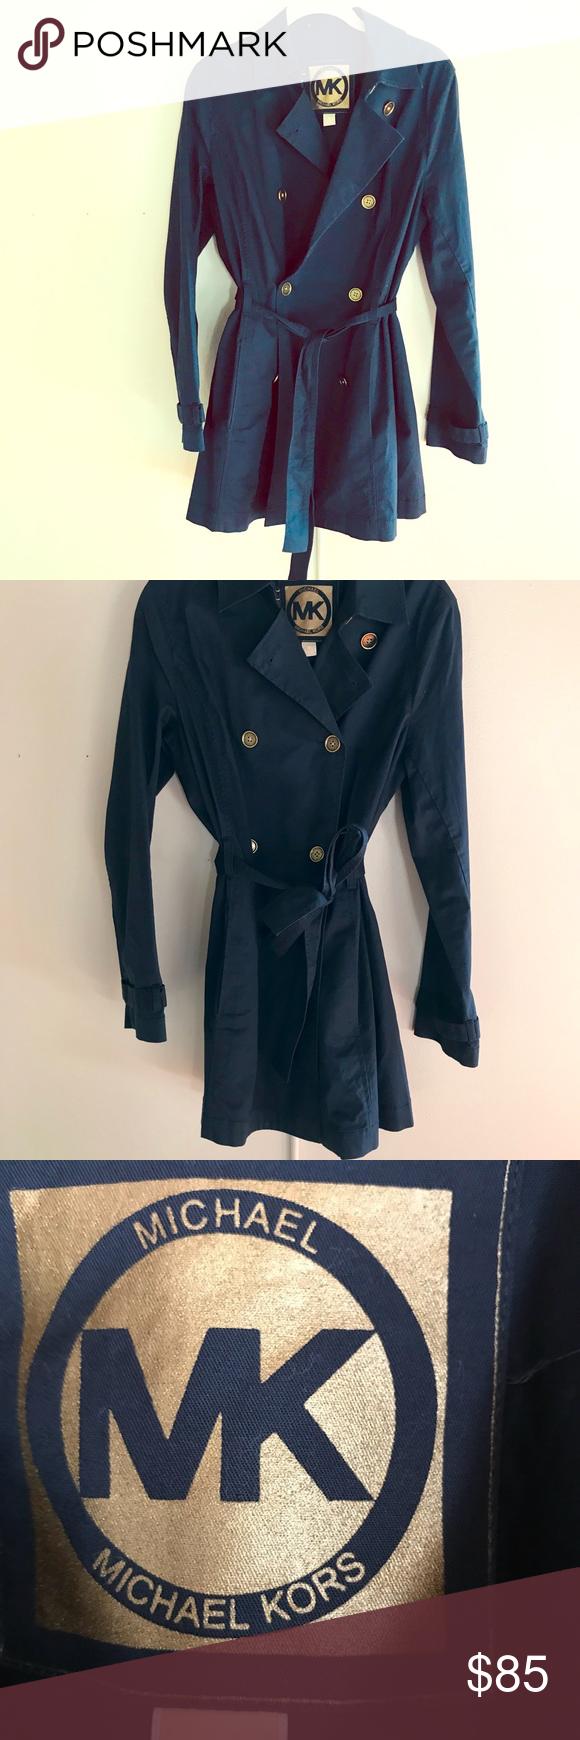 Michael kors navy blue light trench jacket pinterest